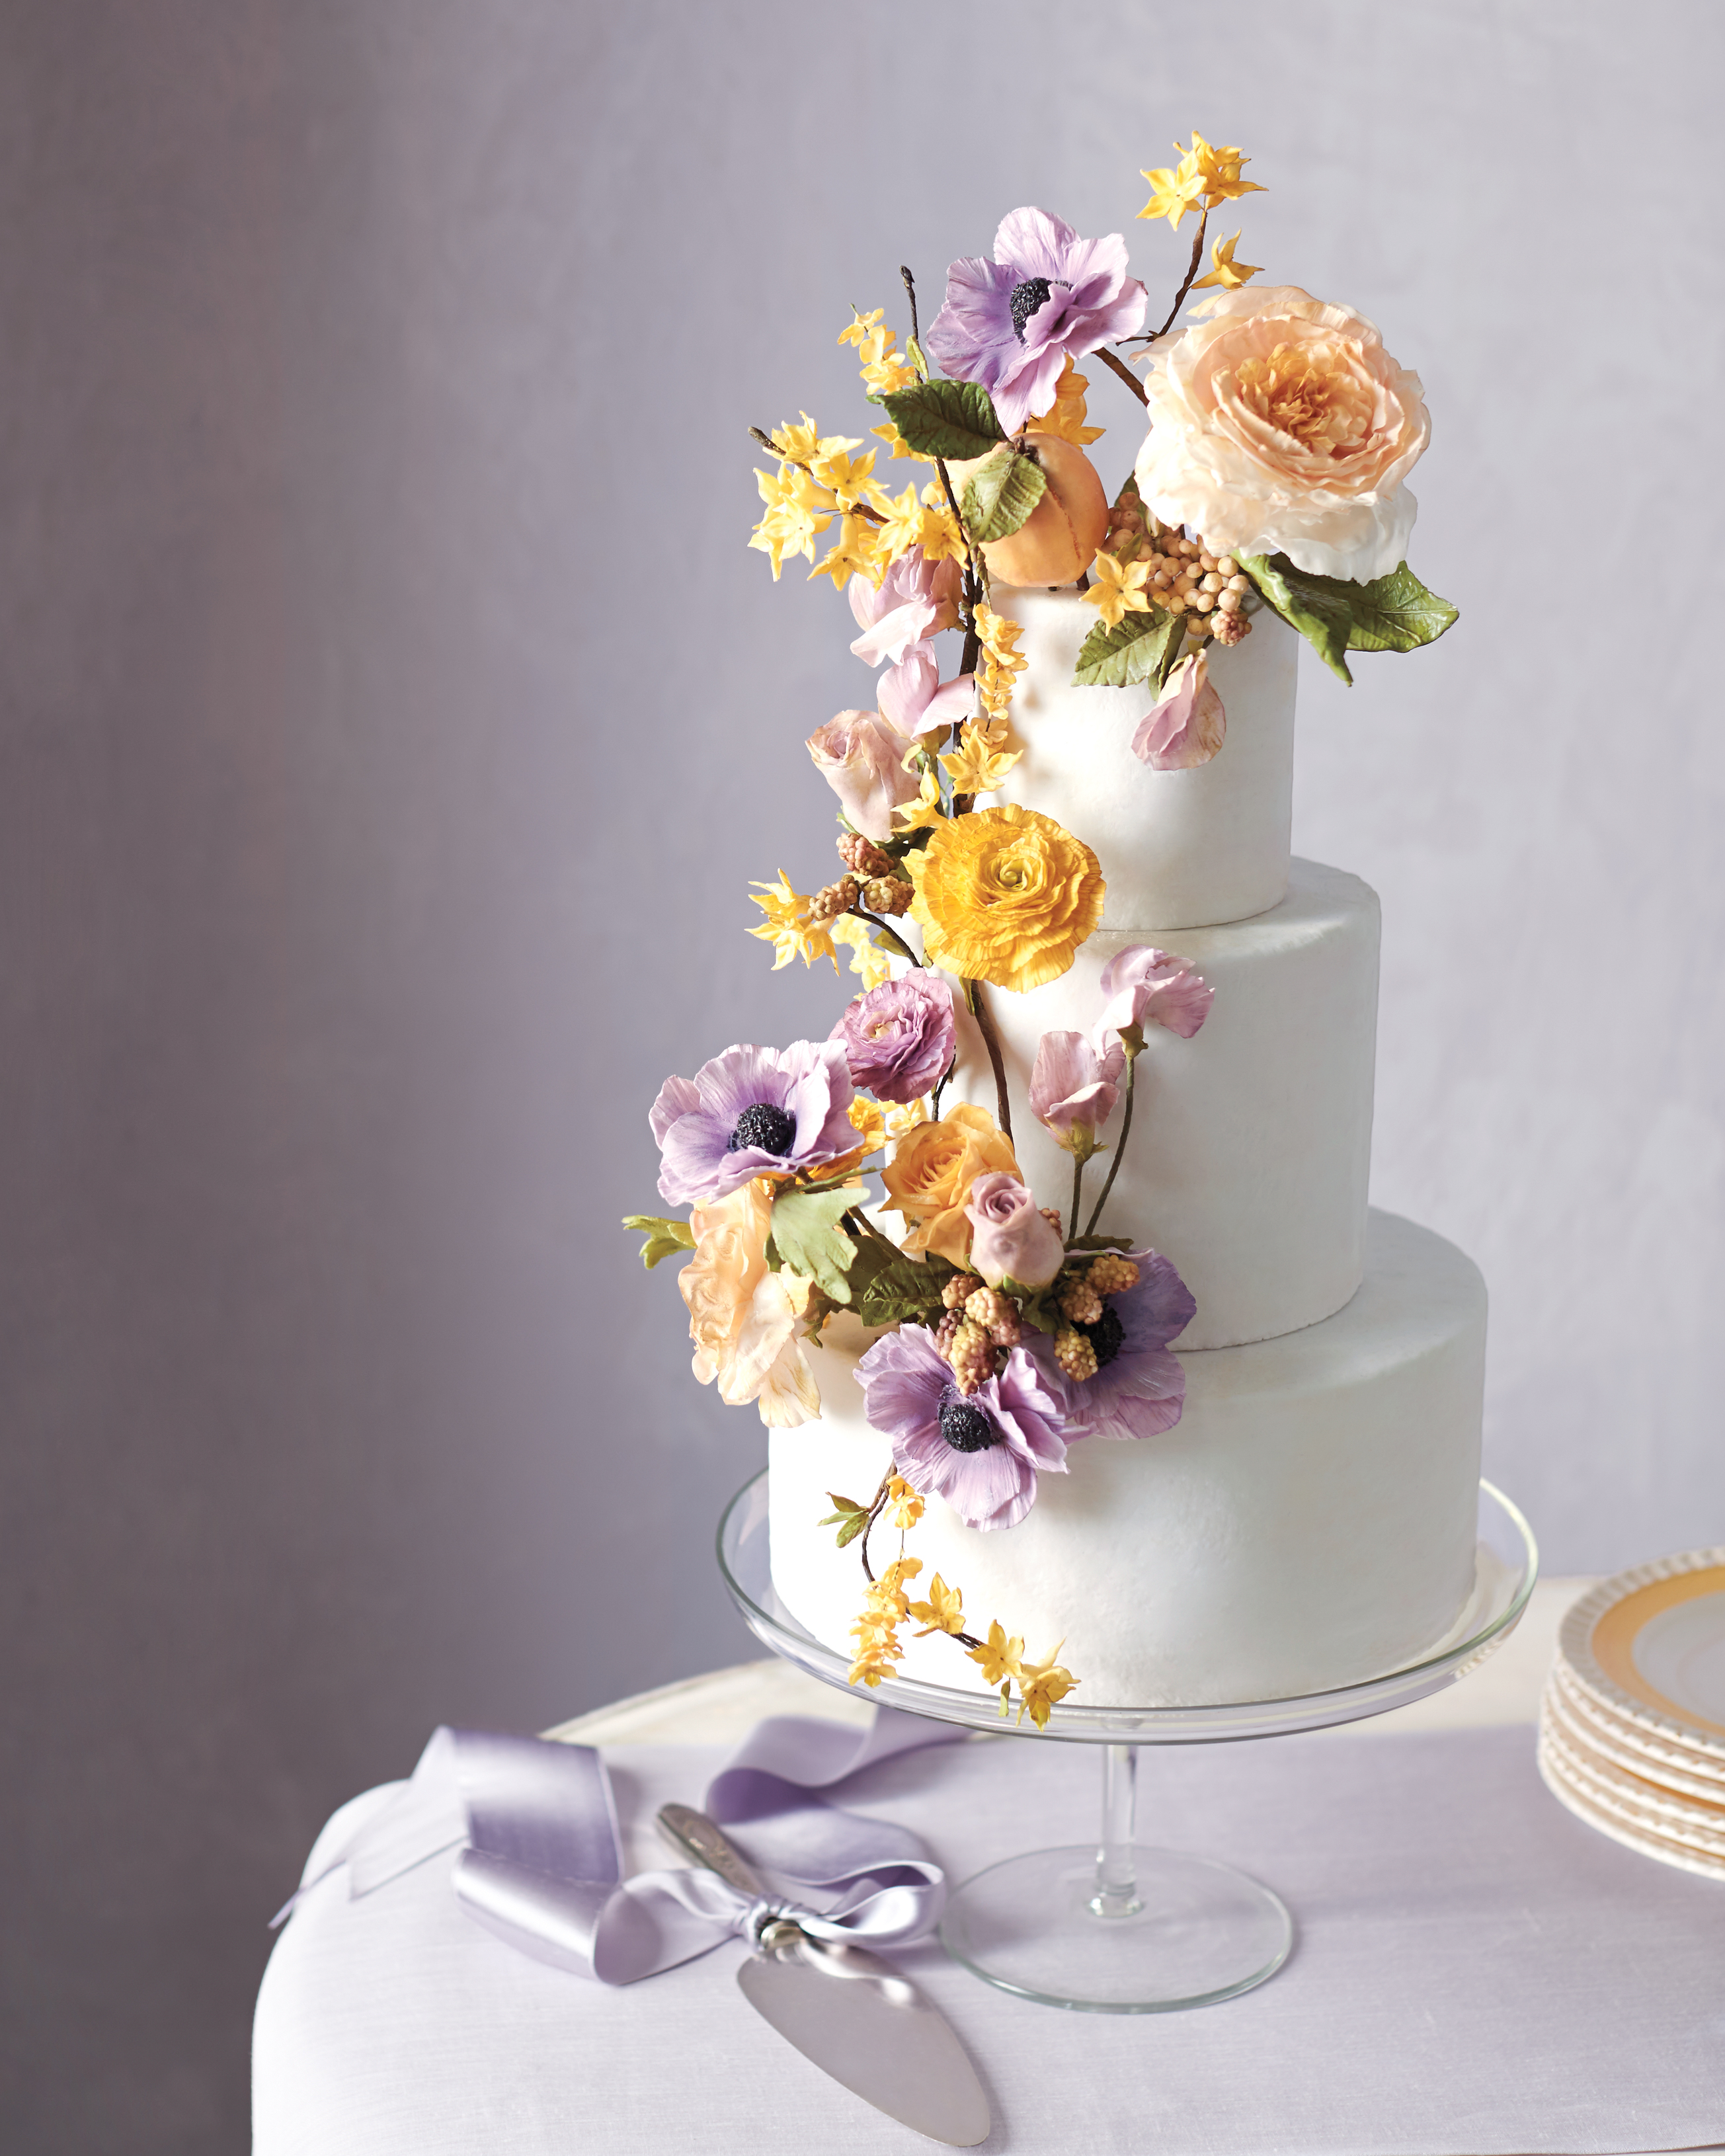 cake-357-mwd110998.jpg